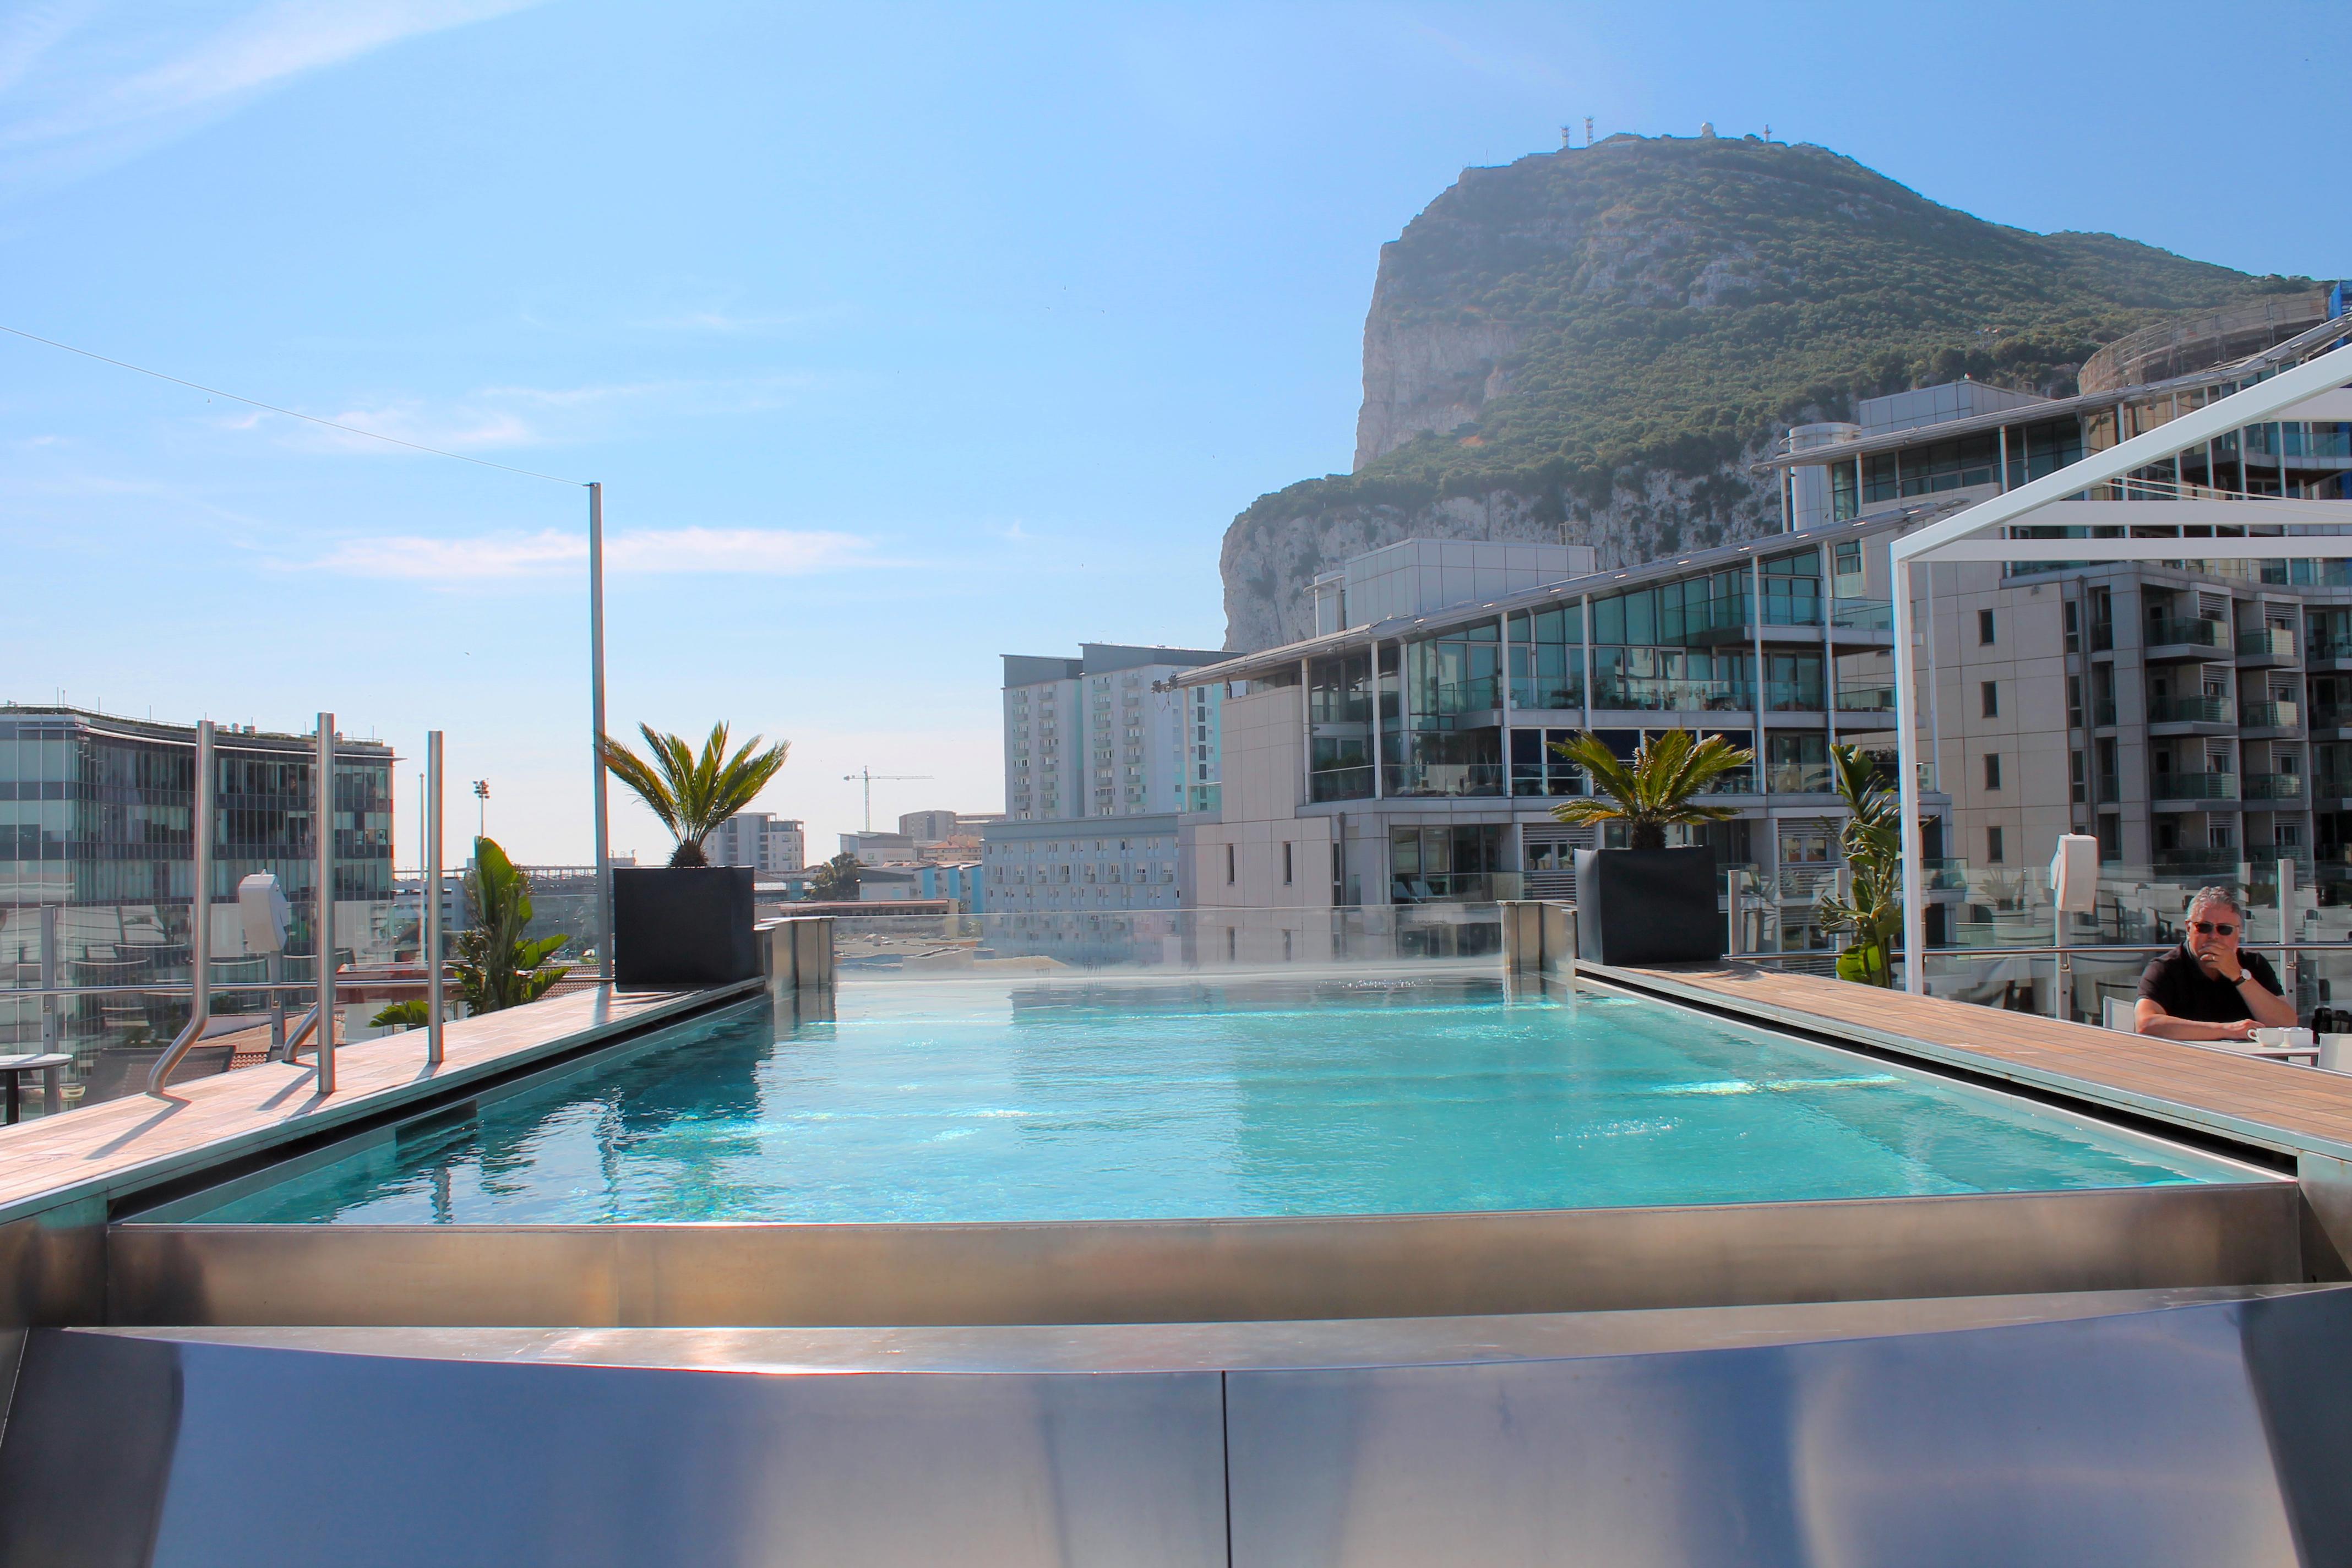 sunborn-hotel-pool-yacht-gibraltar-lustforthesublime